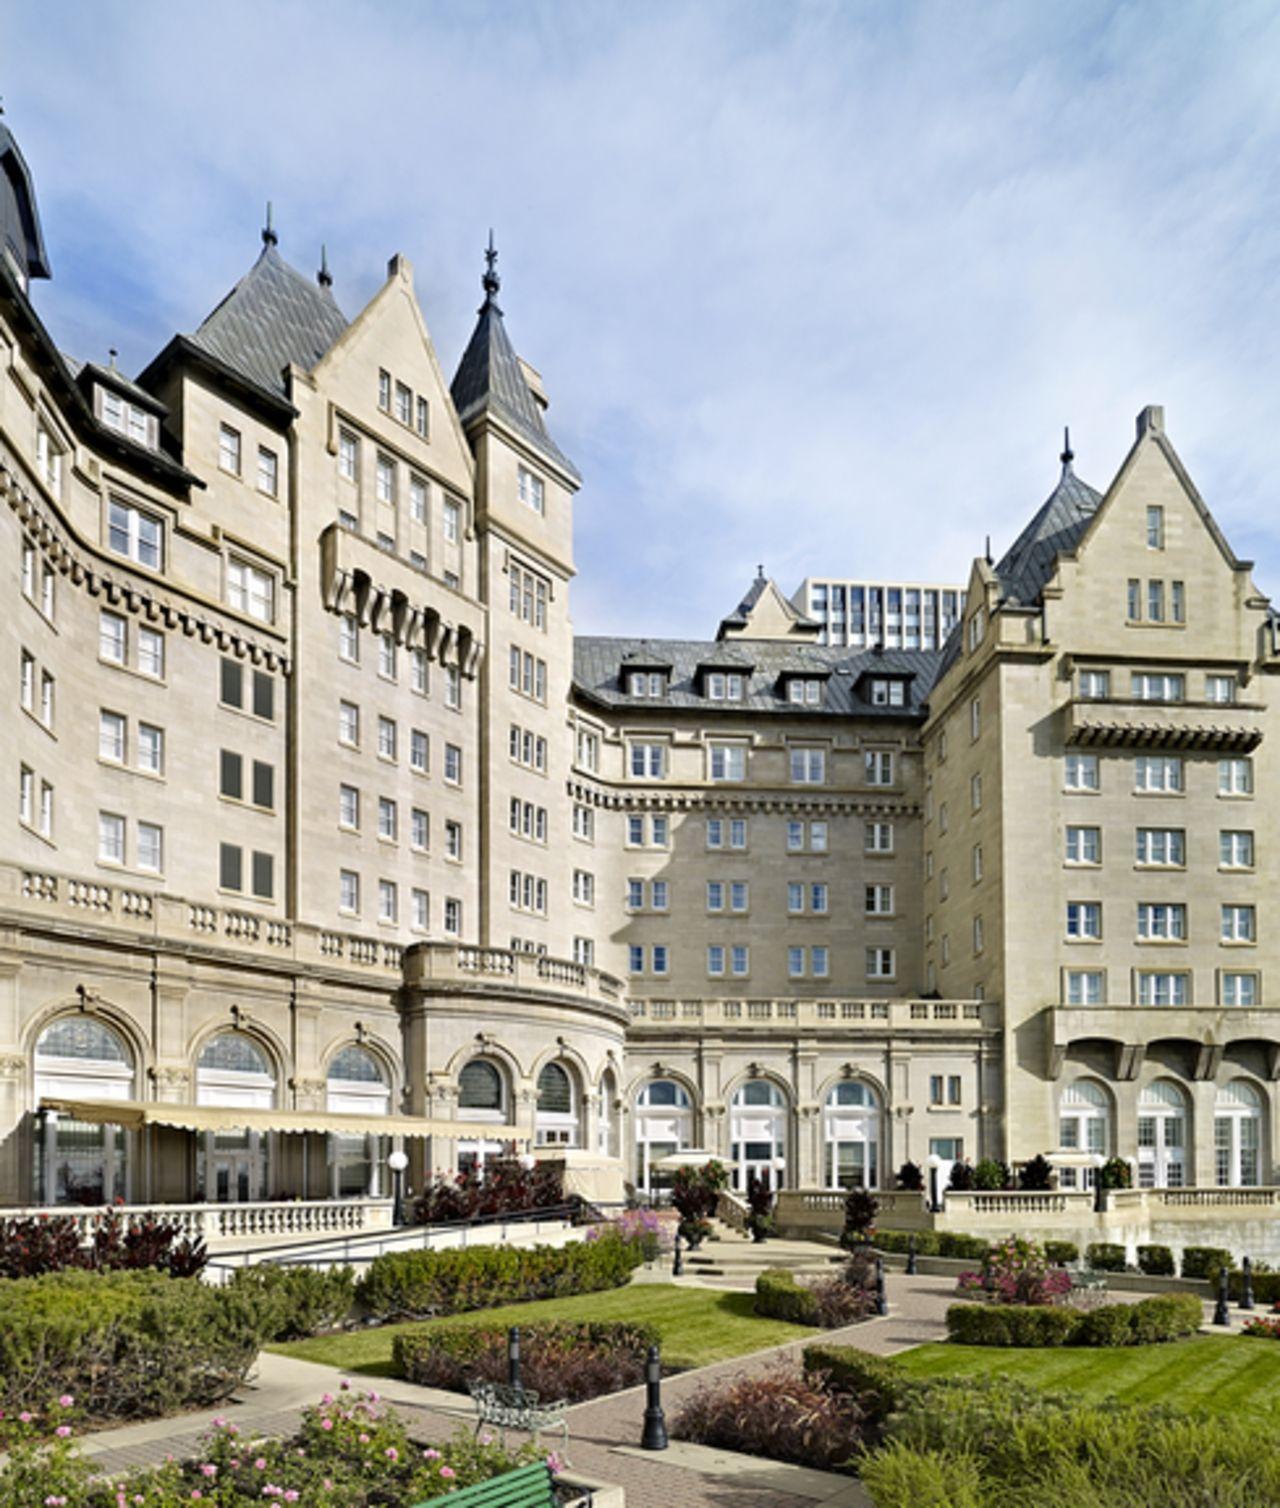 Fairmont Hotel Macdonald Edmonton Alberta With Images Hotel